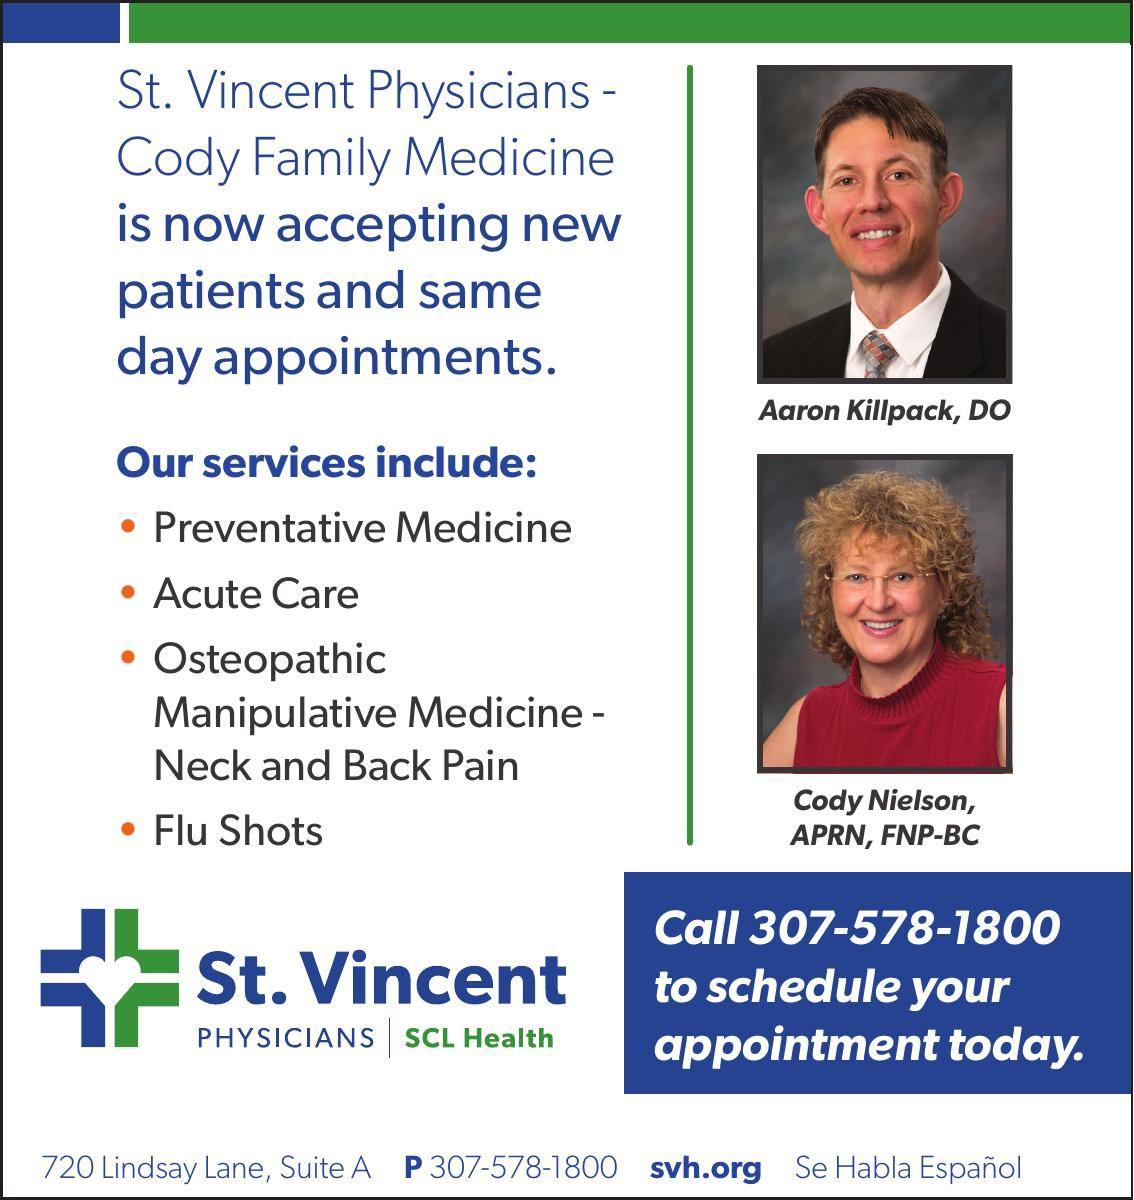 008587_st_vincent_healthcare_rustler_generic_health